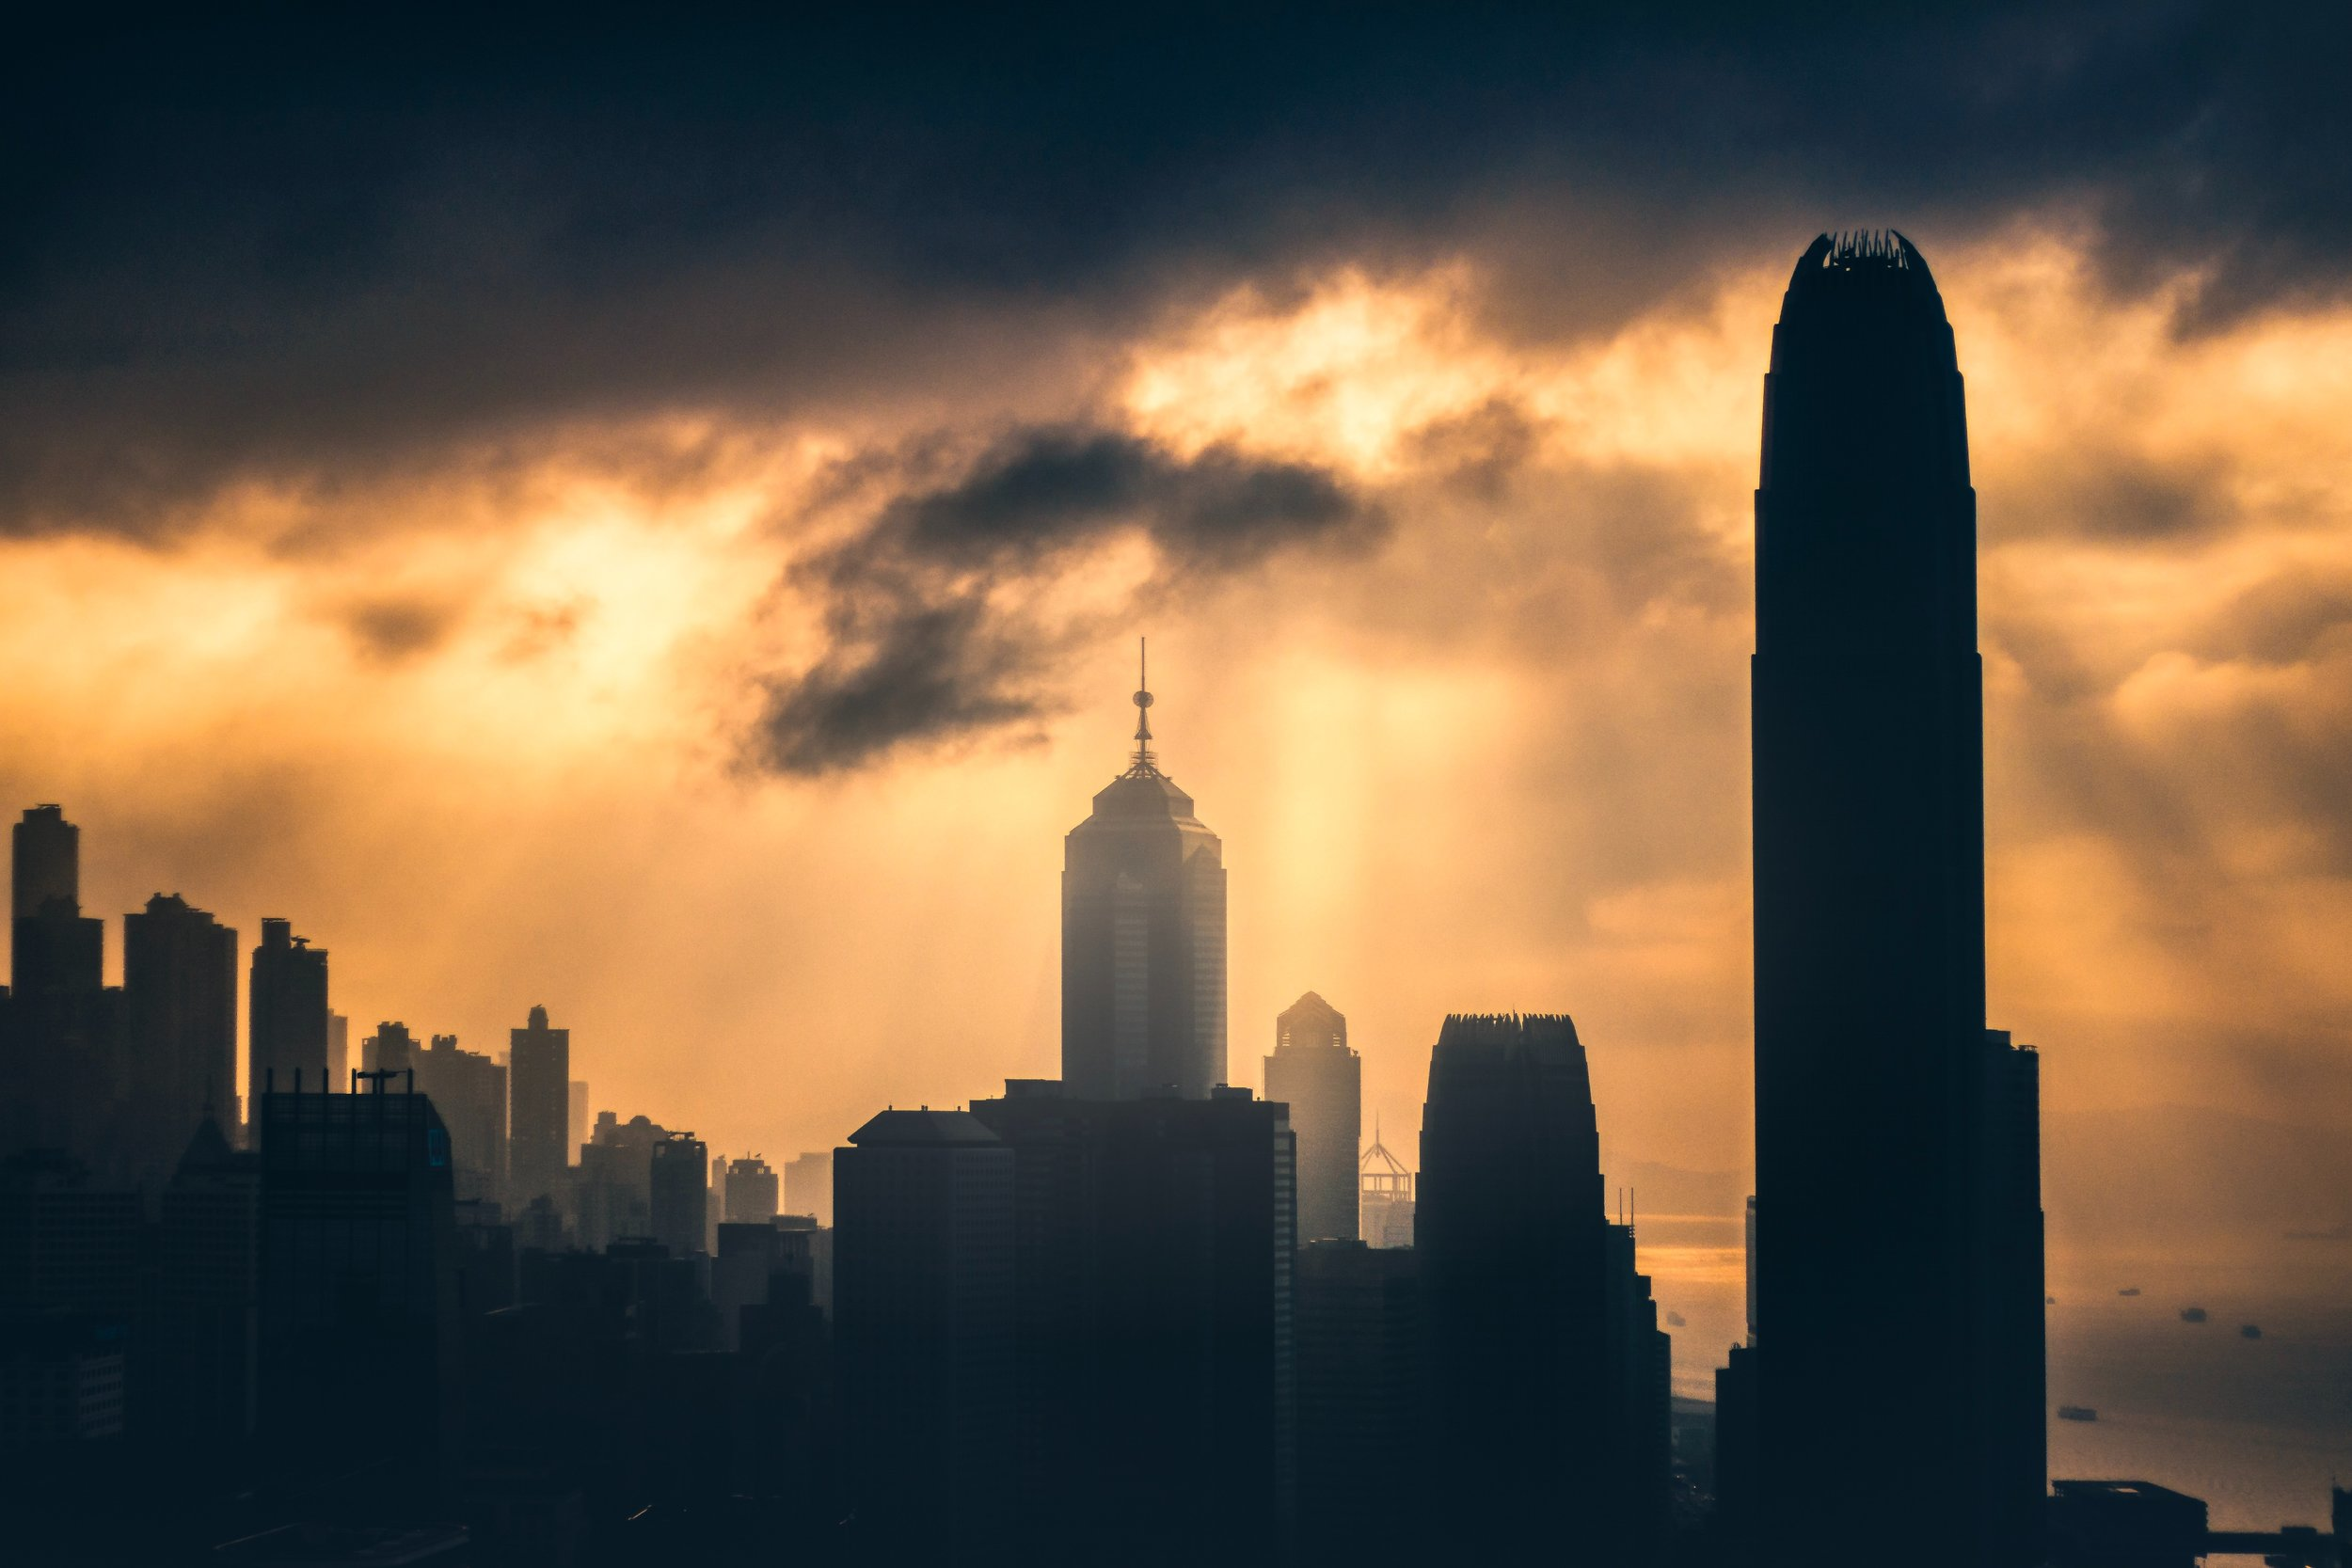 A spooky cityscape.